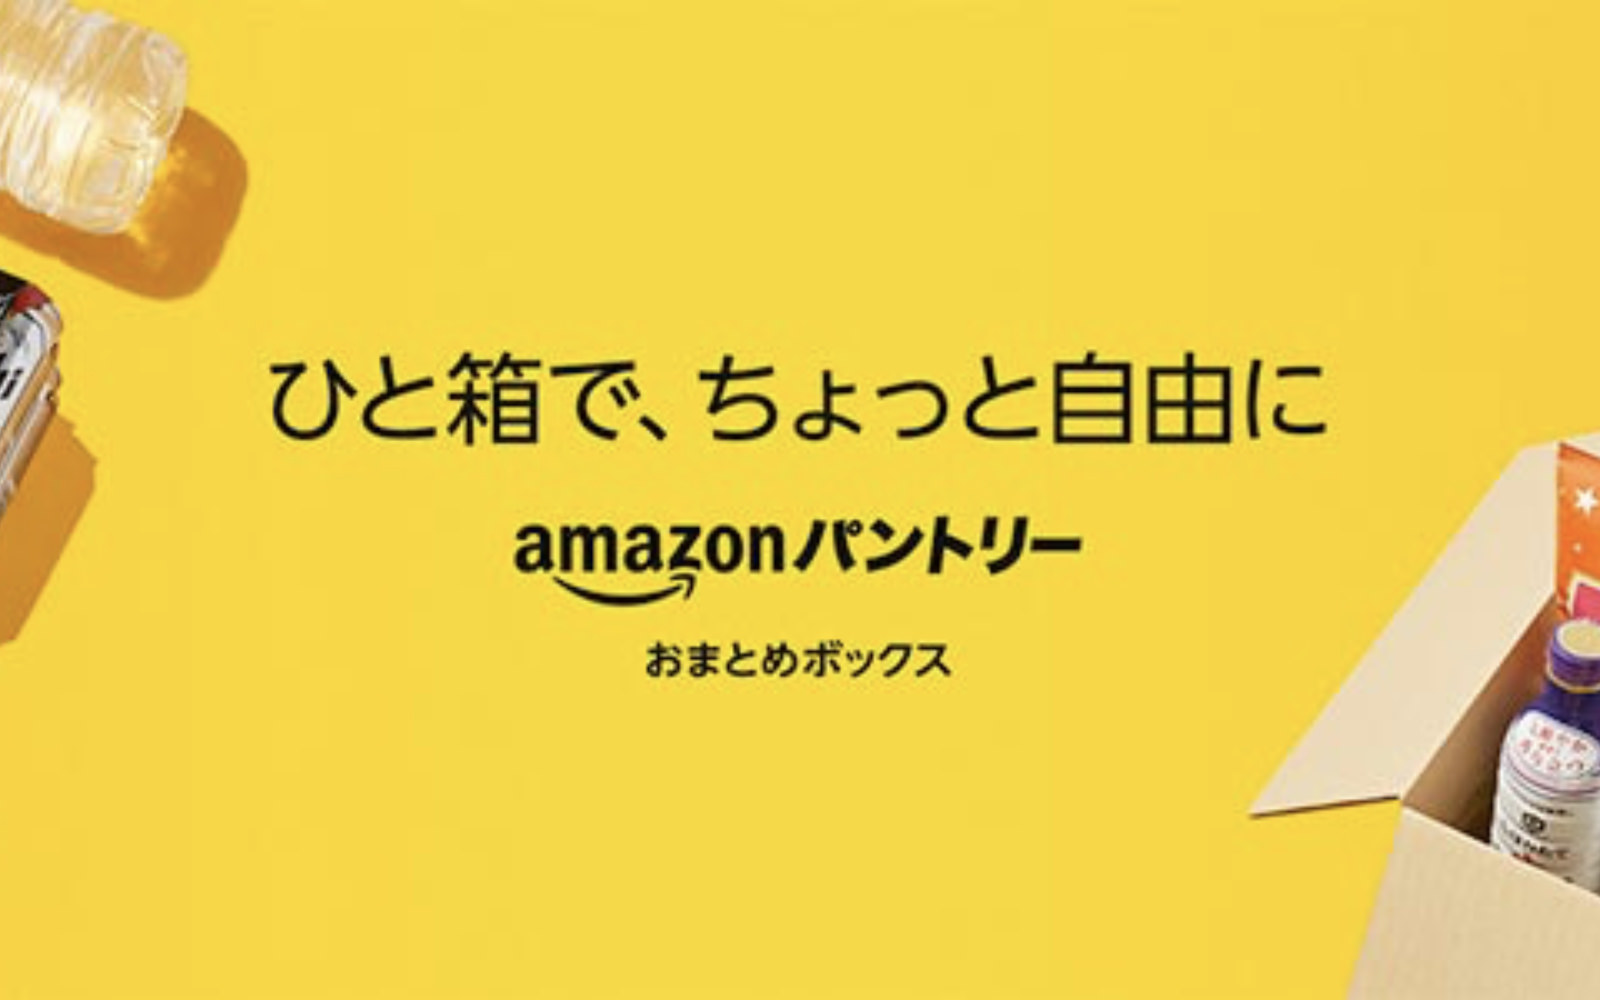 Amazon Pantry ending 20210824